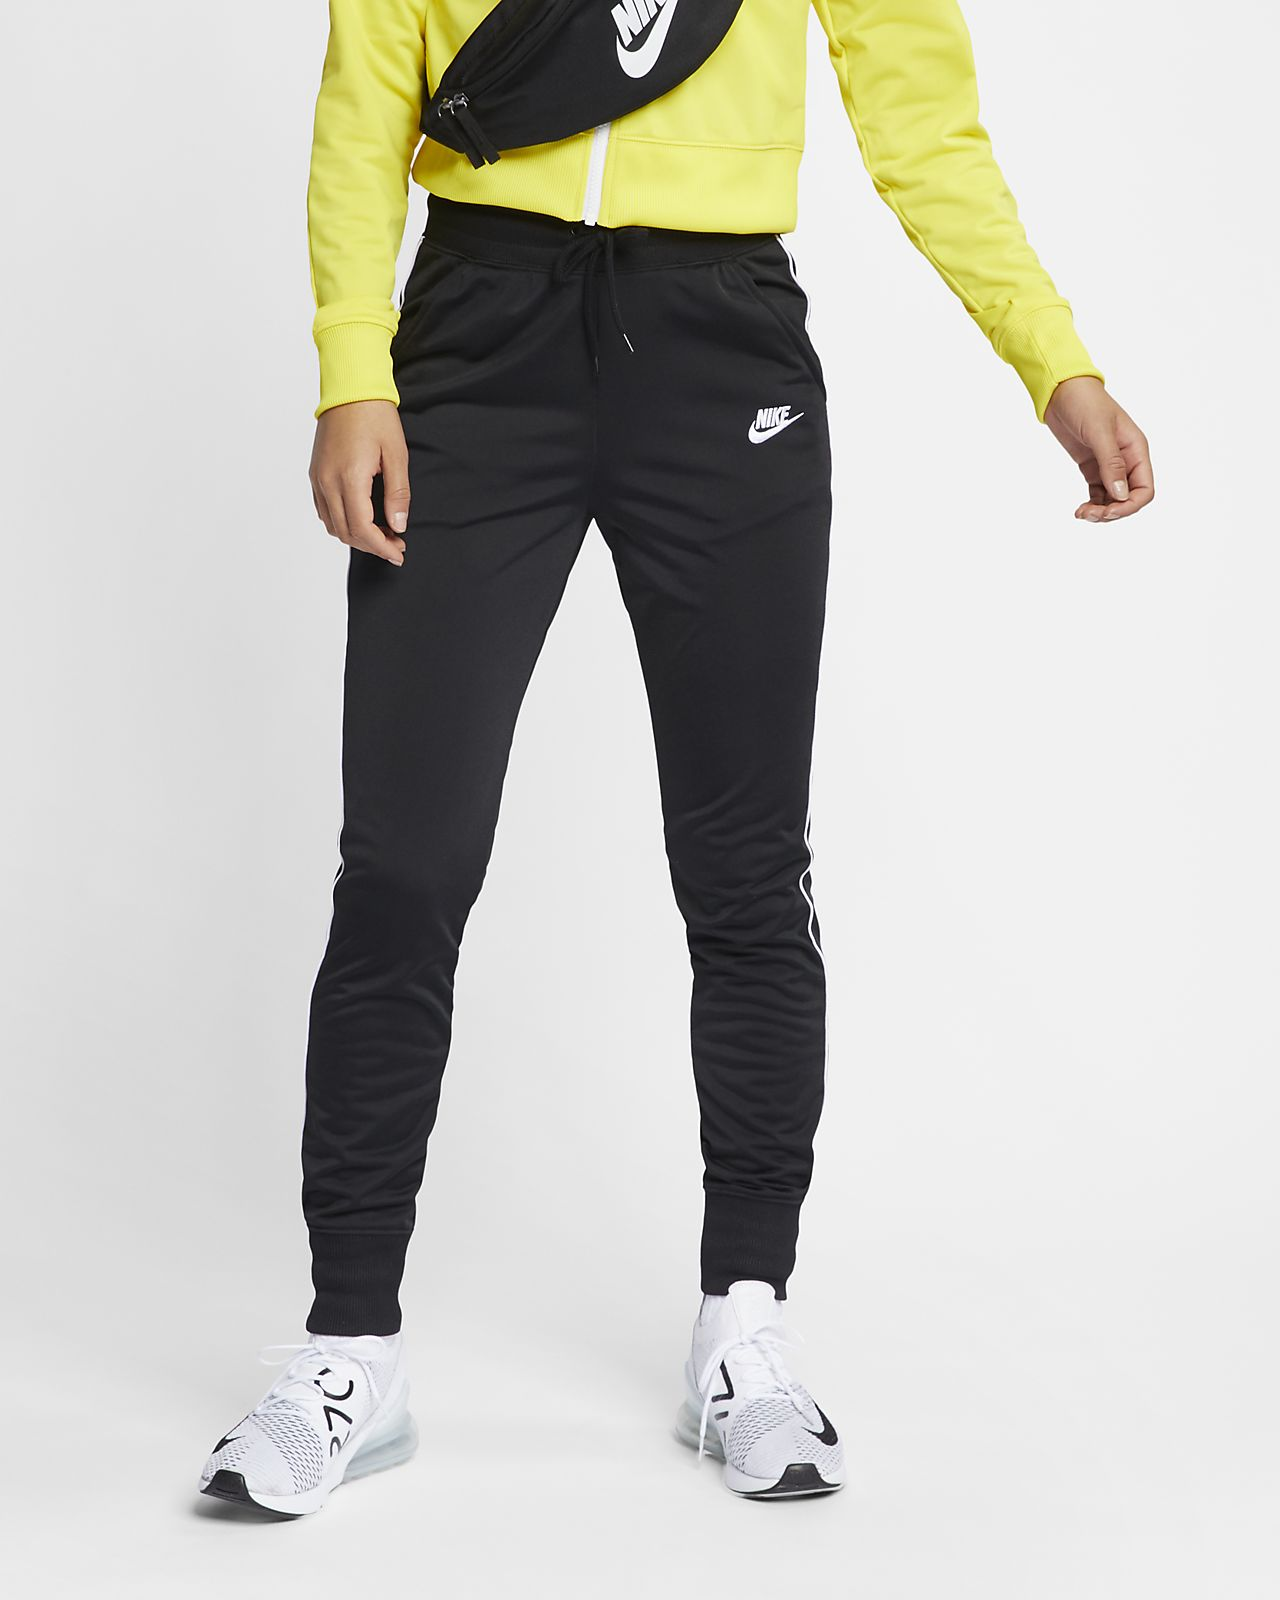 De Pour Sportswear FemmeBe Heritage Jogging Nike Pantalon dCshrQt